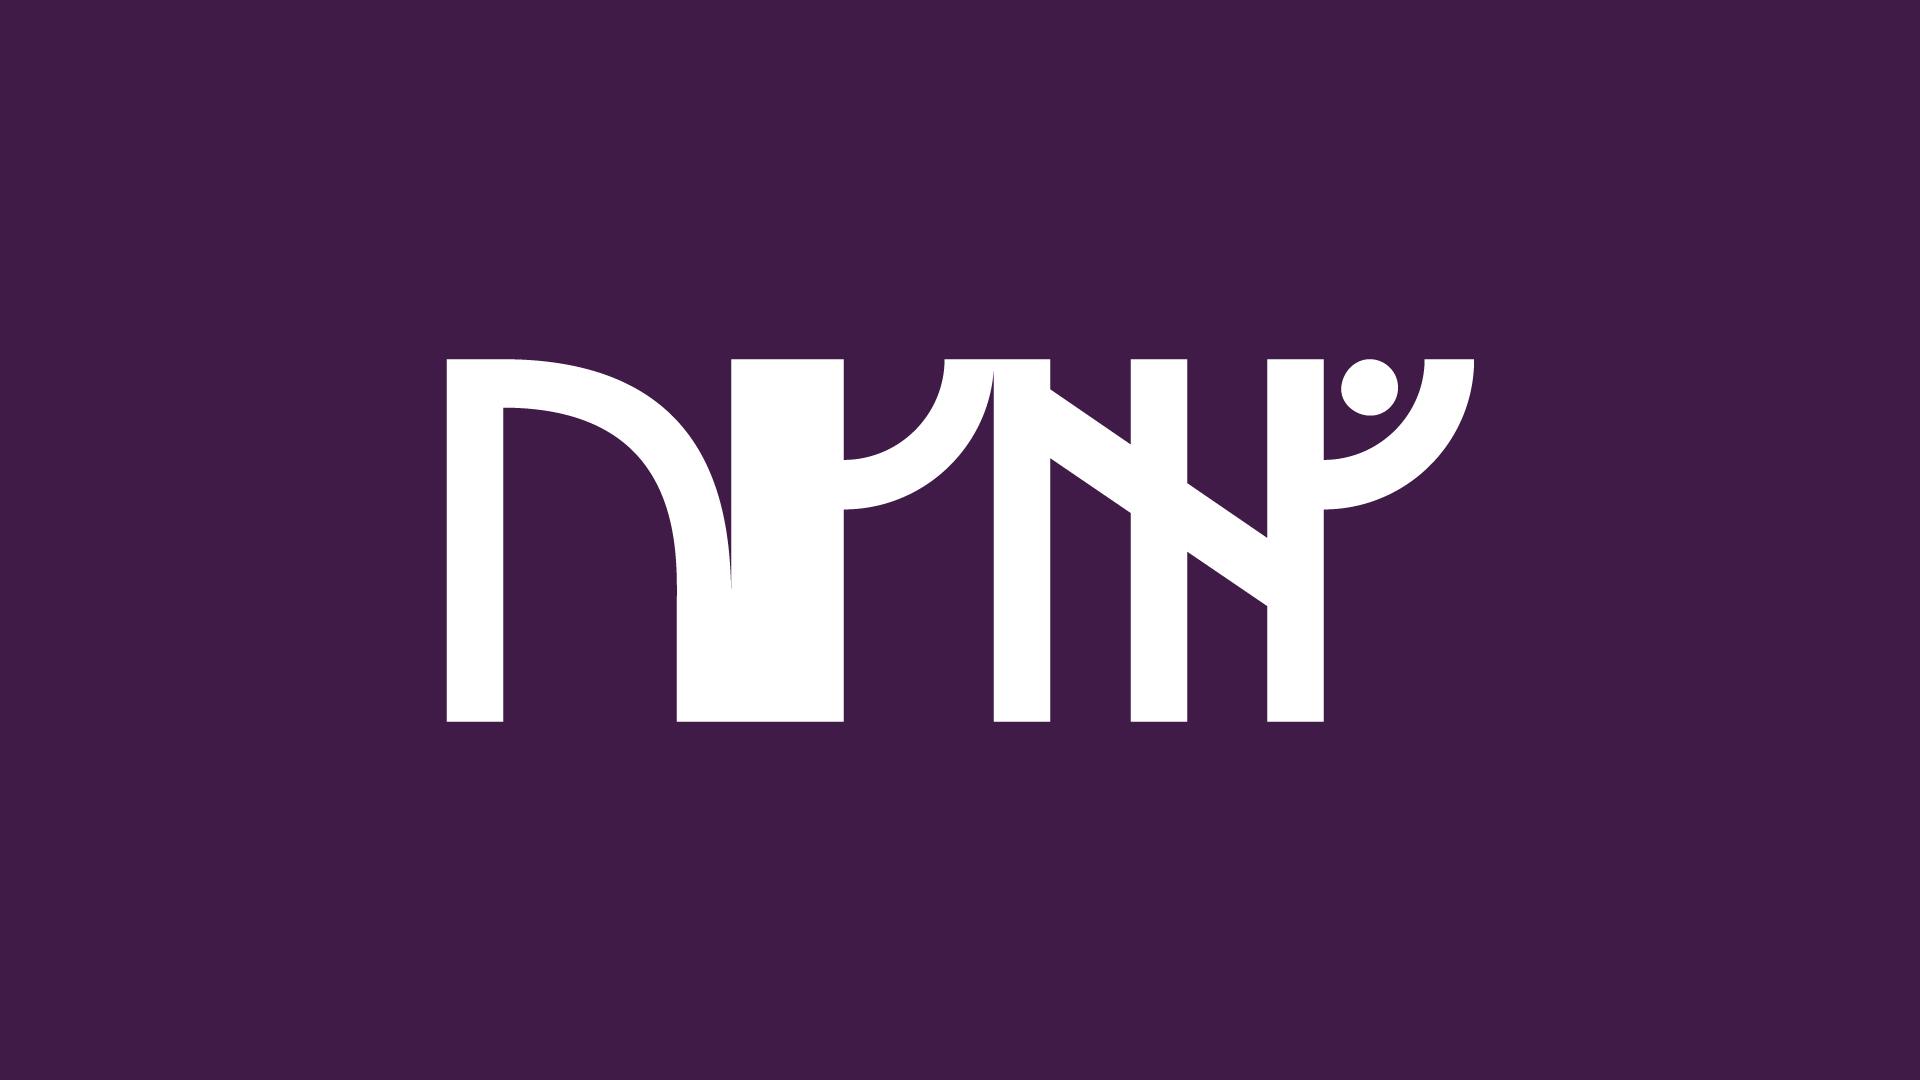 viking_logo_philipjohansen